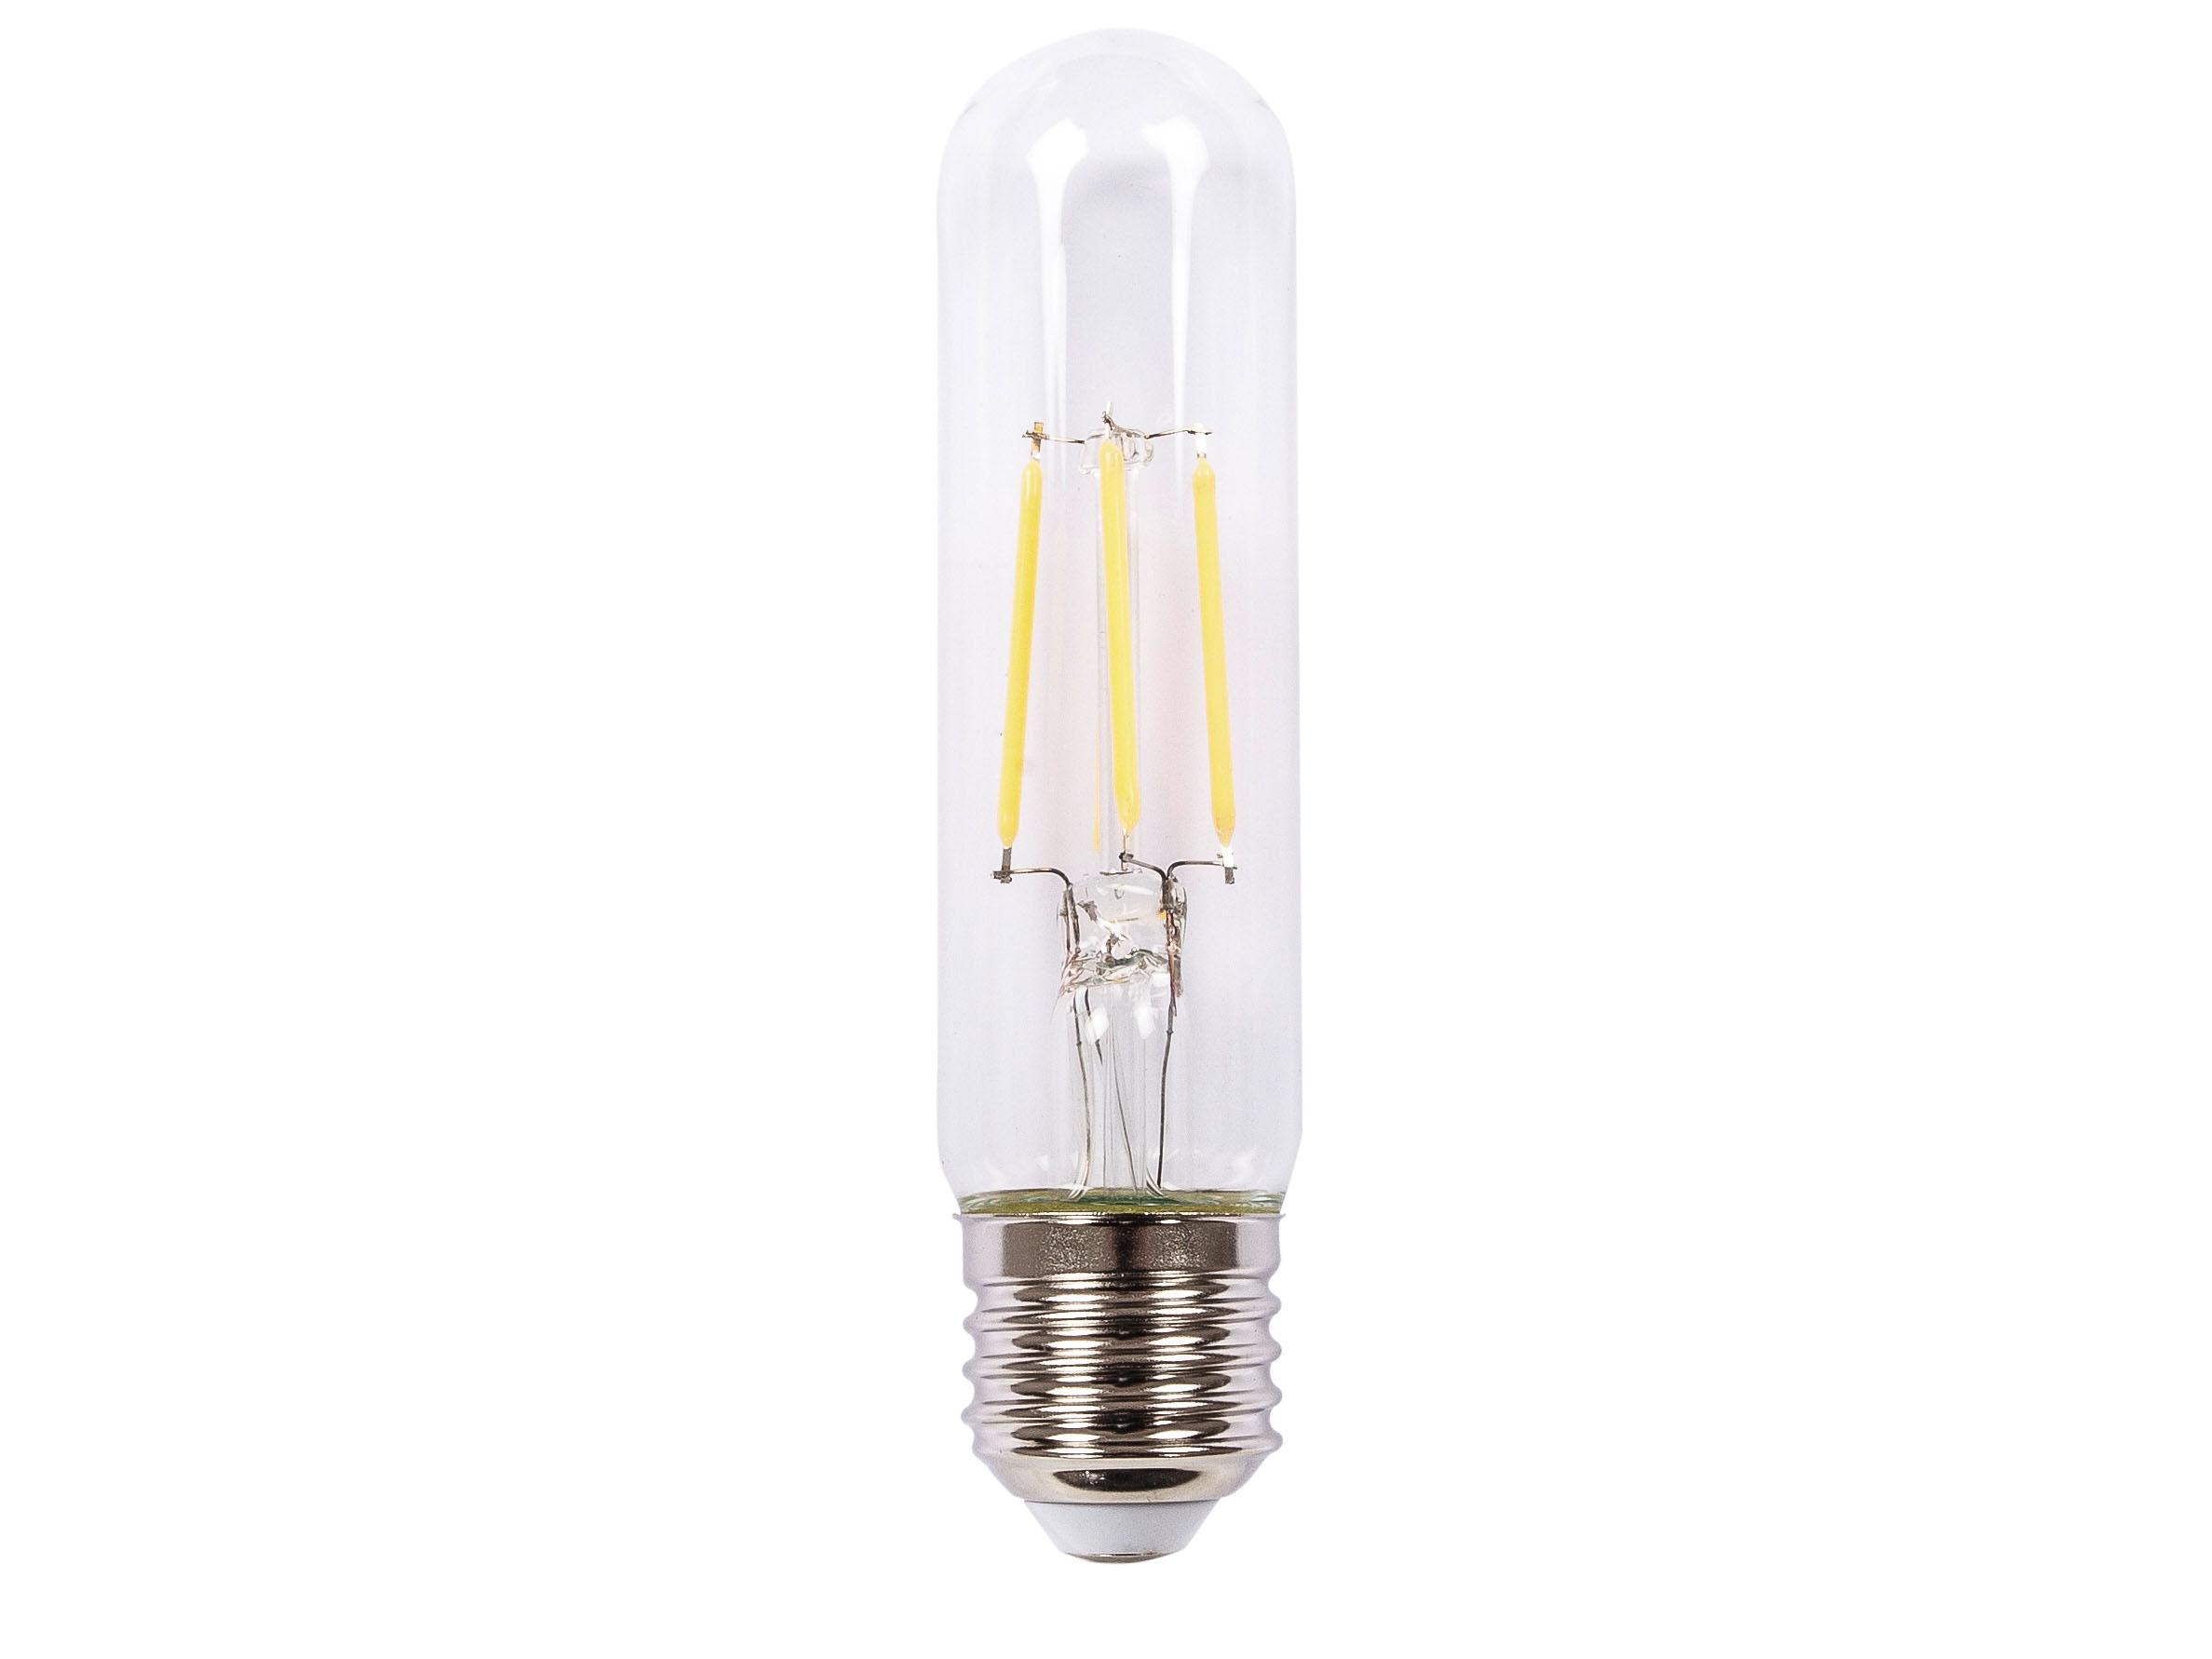 Sfeervolle Led Verlichting : Sfeervolle witte led lampenbol kopen verlichting